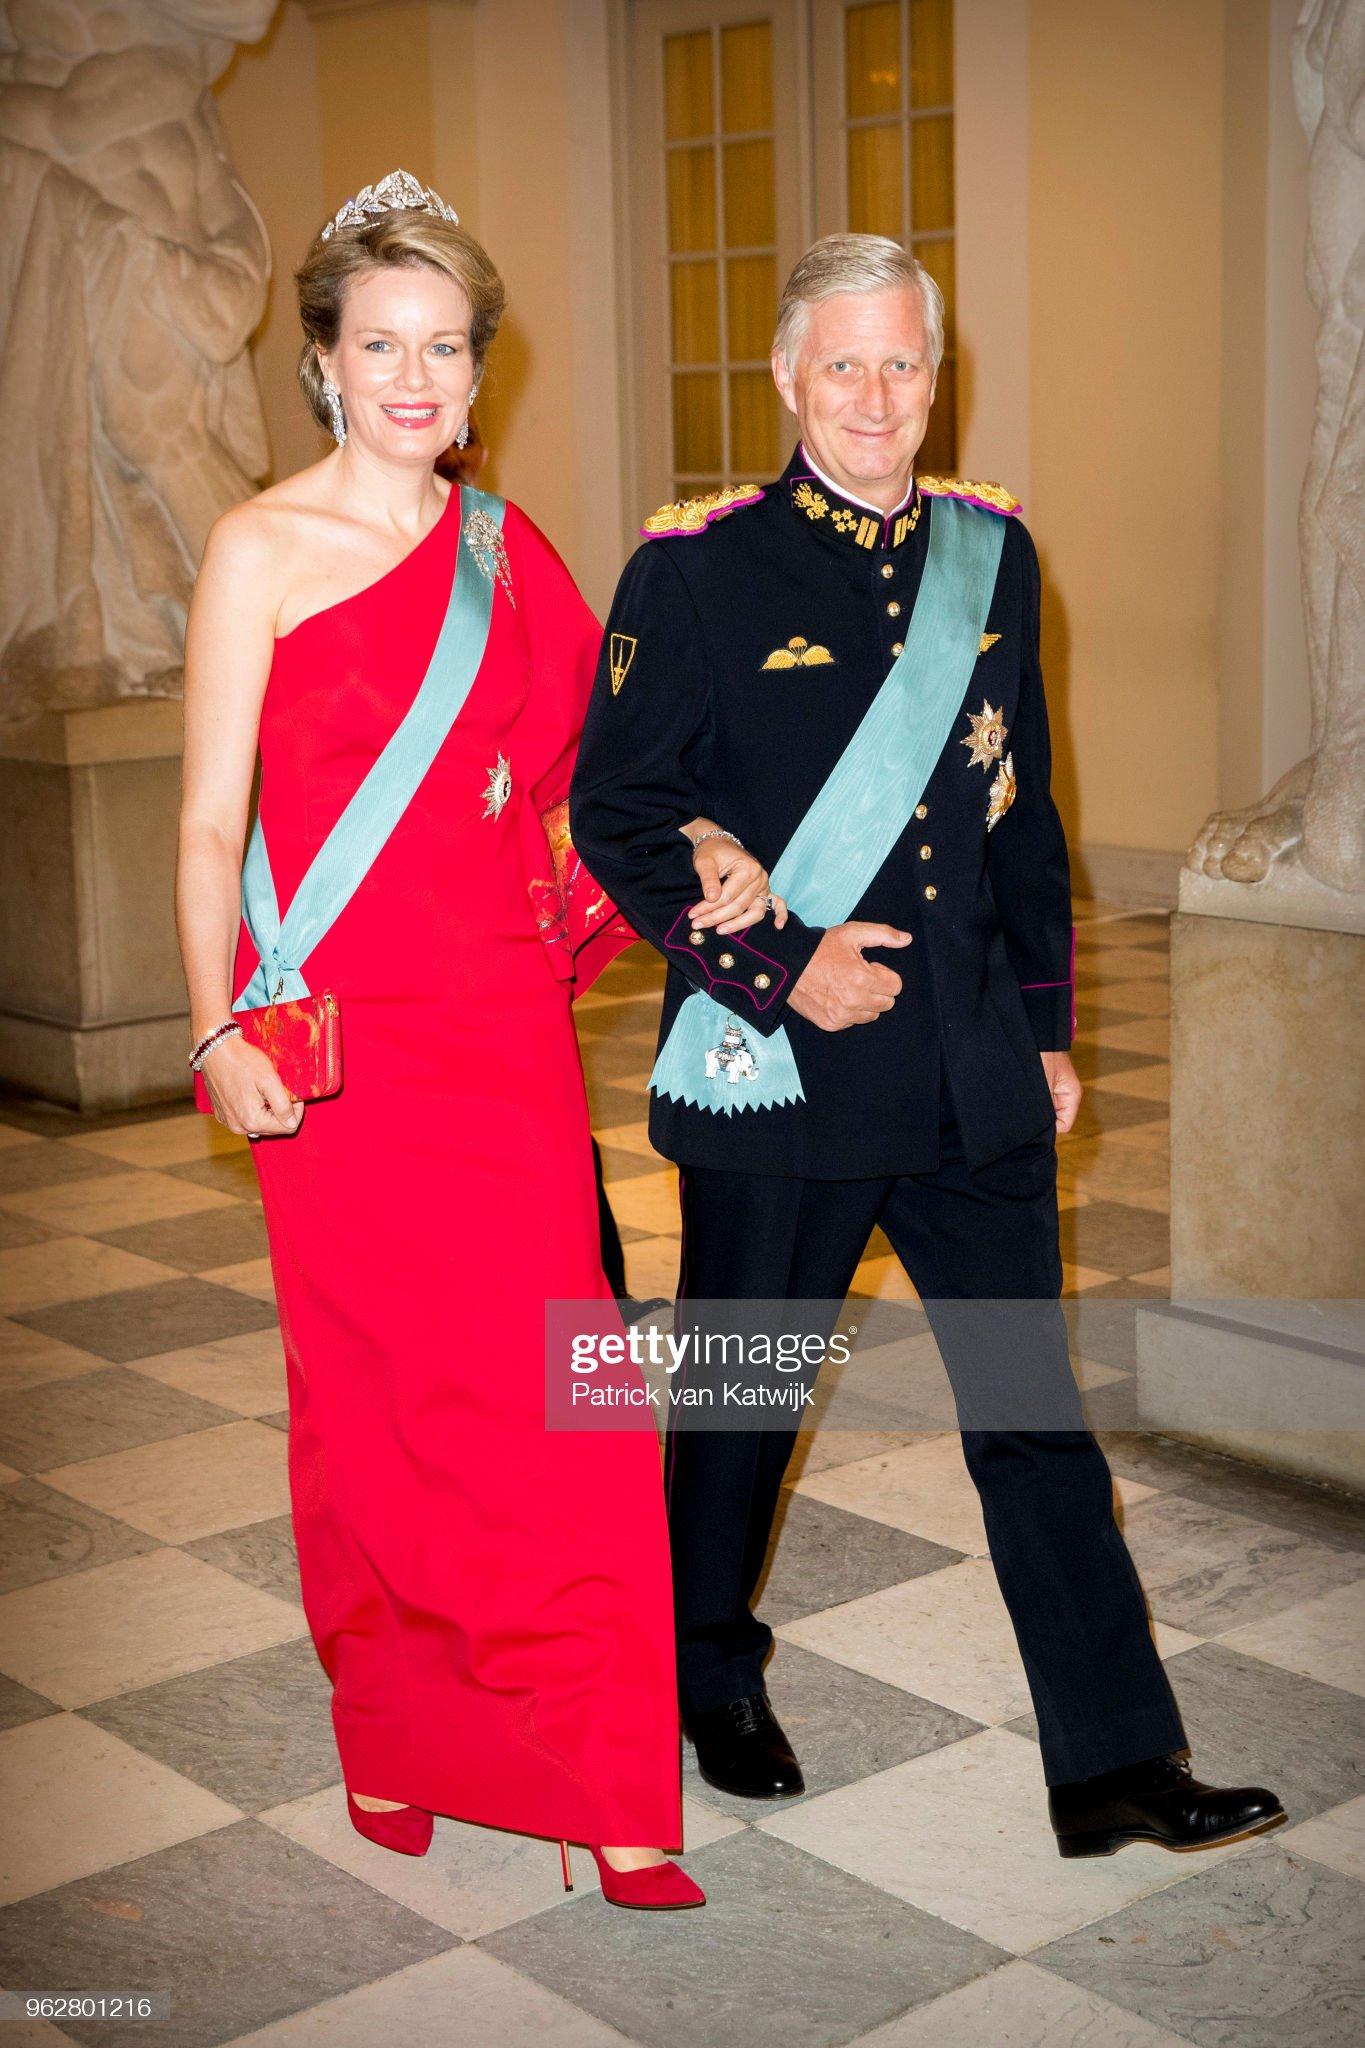 Вечерние наряды Королевы Матильды Crown Prince Frederik of Denmark Holds Gala Banquet At Christiansborg Palace : News Photo